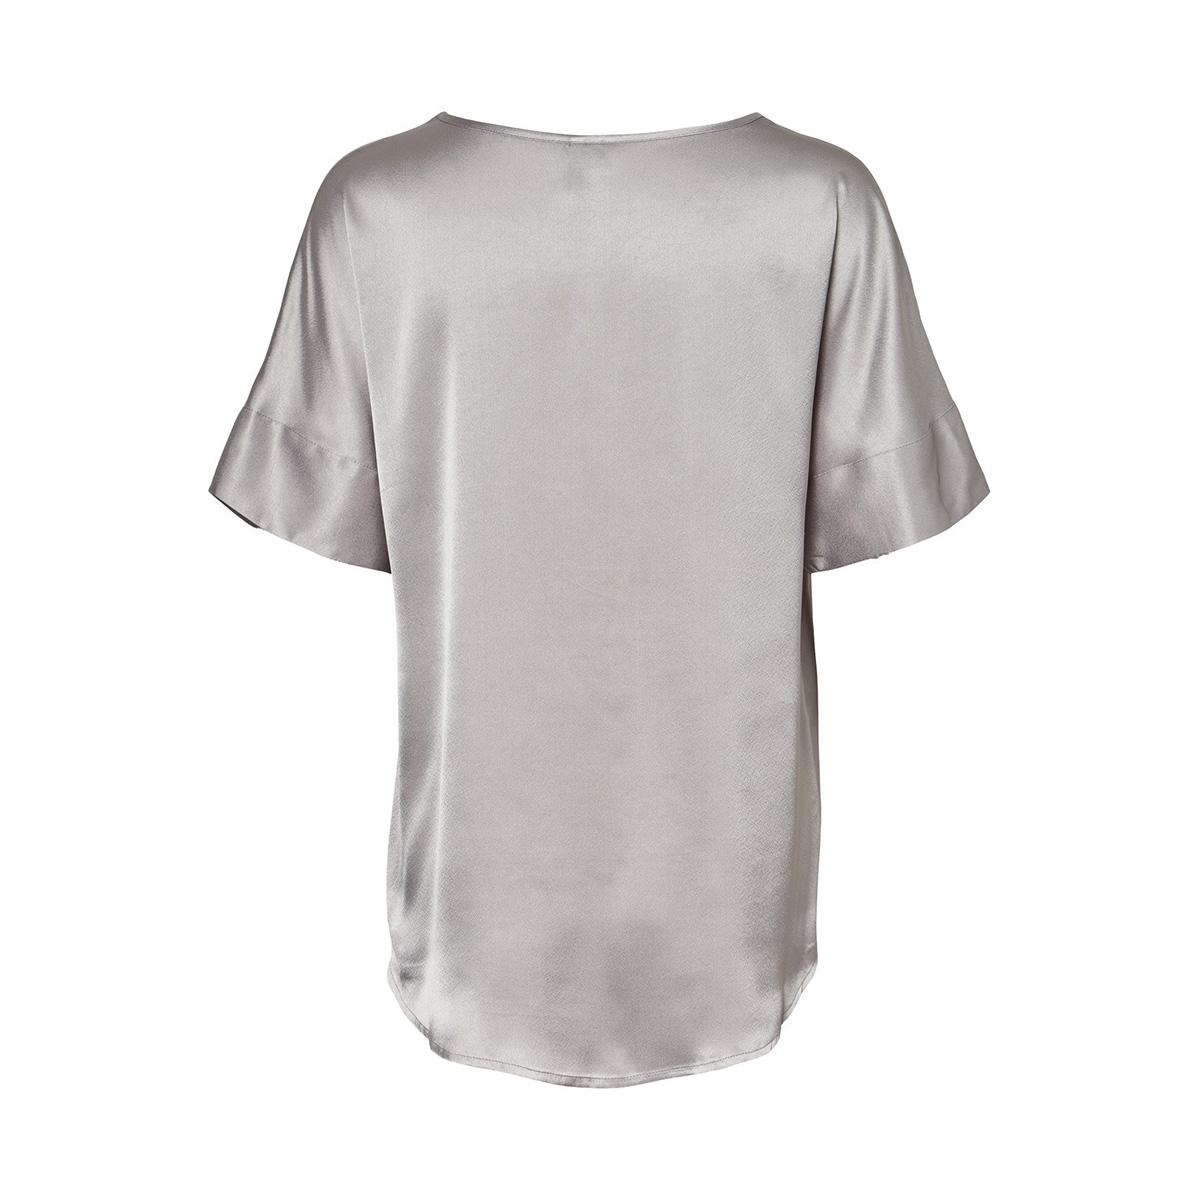 vmjessica 2/4 top sb1 10228384 vero moda t-shirt silver sconce